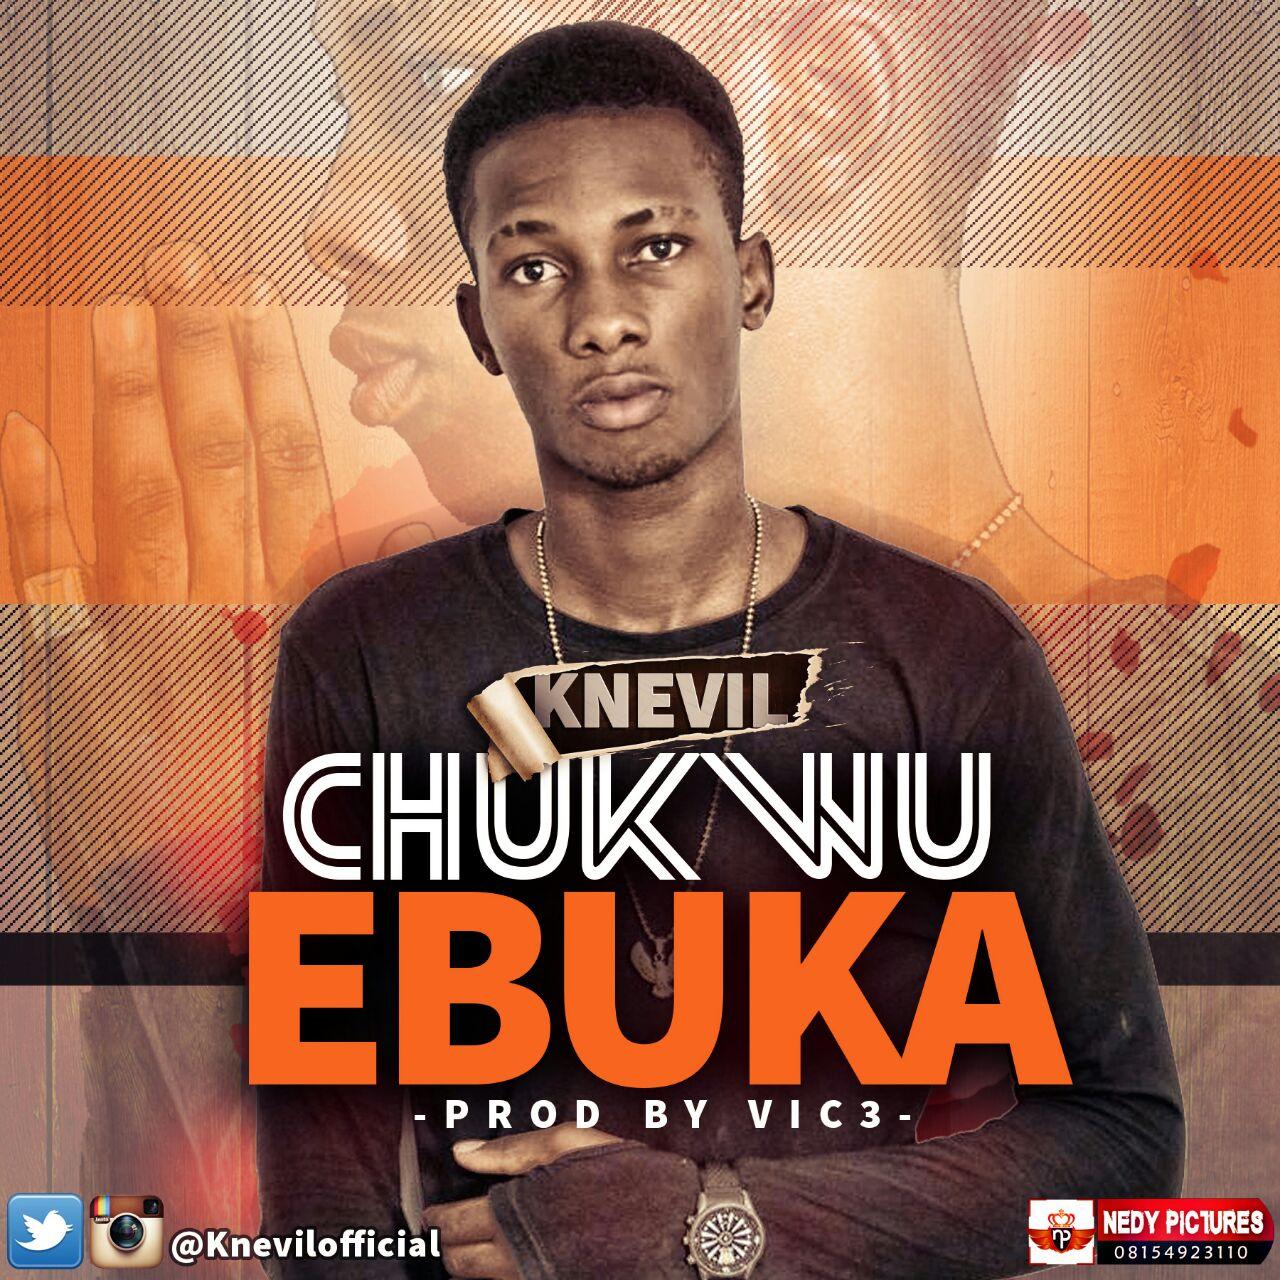 DOWNLOAD Music: Knevil – Chukwu Ebuka (Prod. By VIK3)